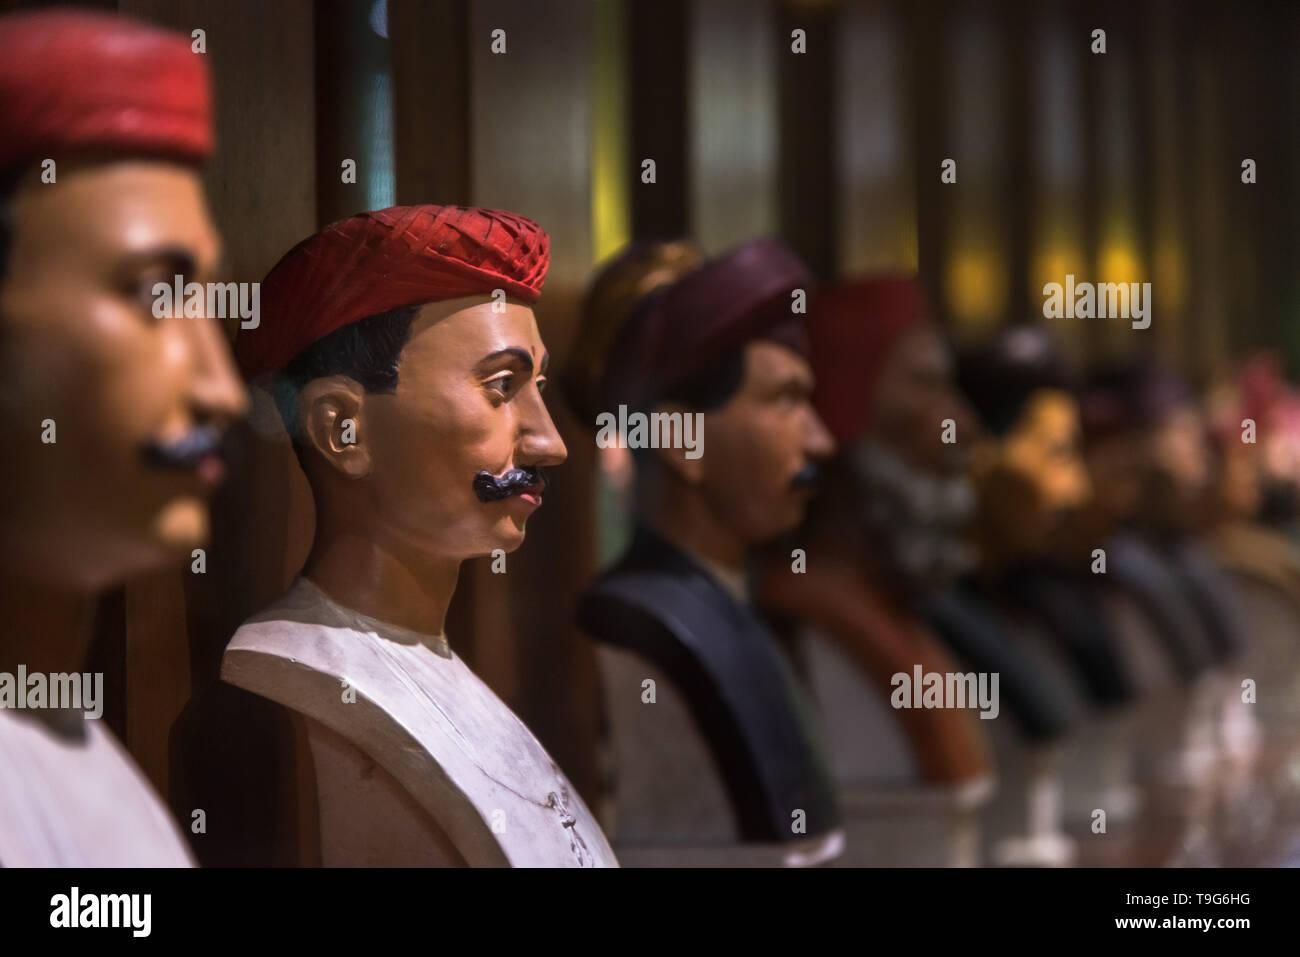 People of the city, Dr Bhau Daji Lad Museum, Mumbai, India - Stock Image